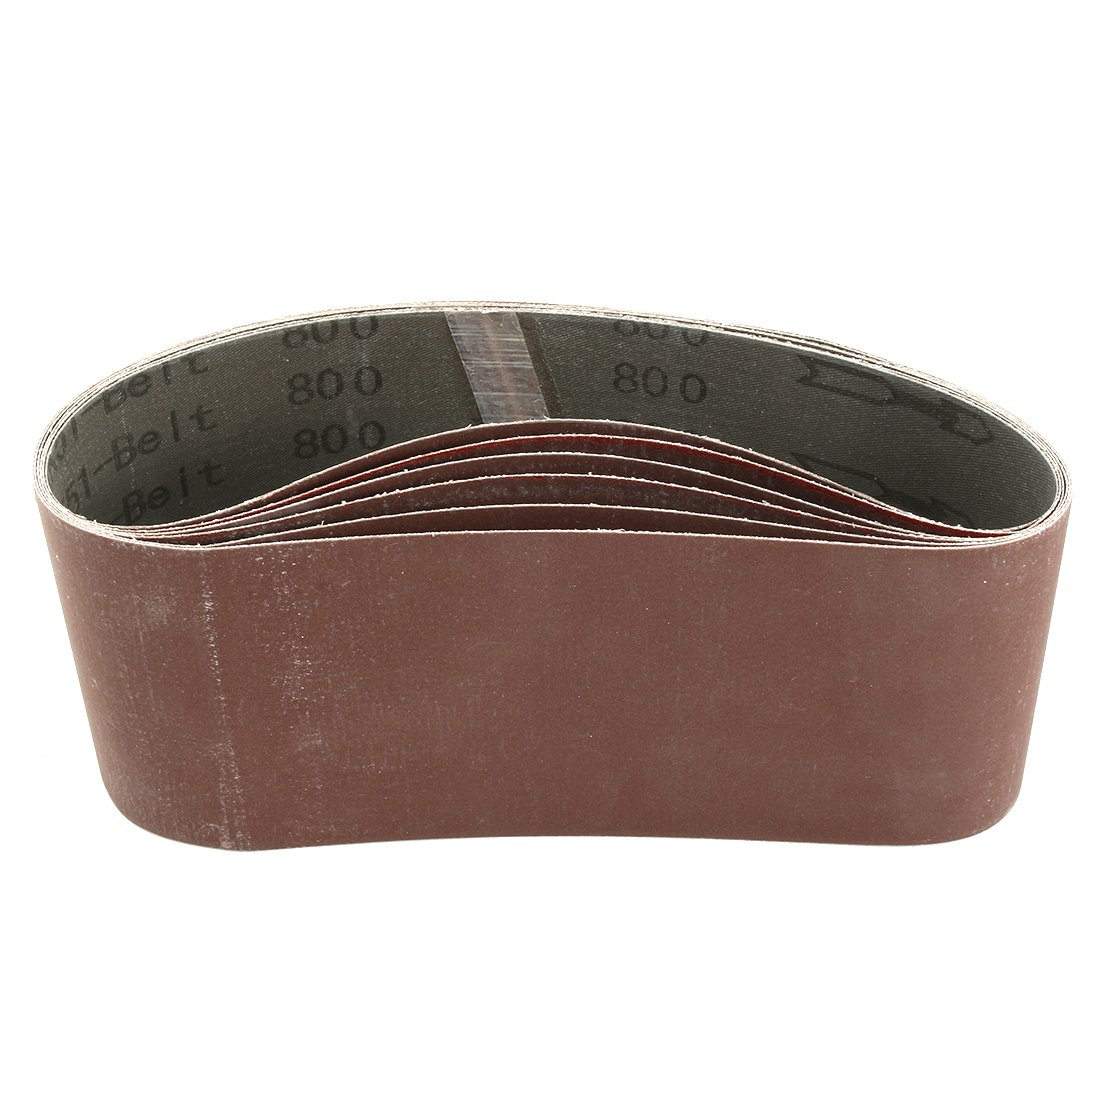 uxcell 4-Inch x 24-Inch Aluminum Oxide Sanding Belt 800 Grits Sandpaper Flush Joint for Belt Sander 6pcs